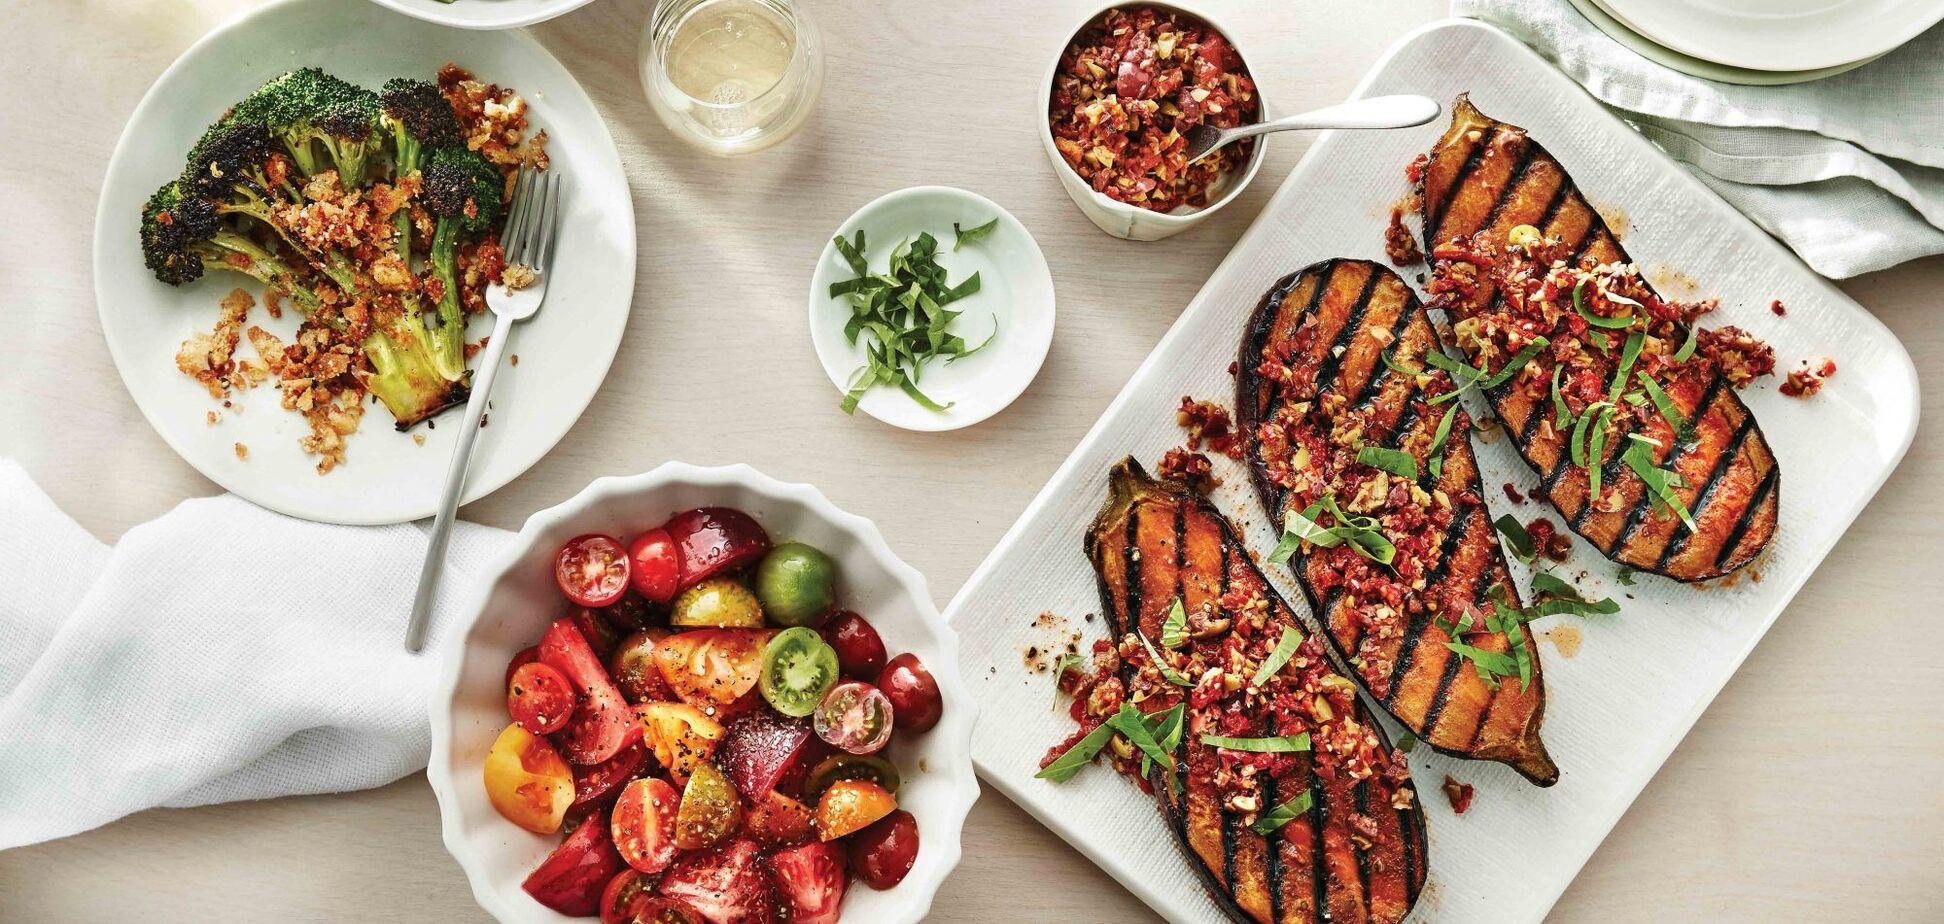 6 рецептов стейков для тех, кто не ест мяса